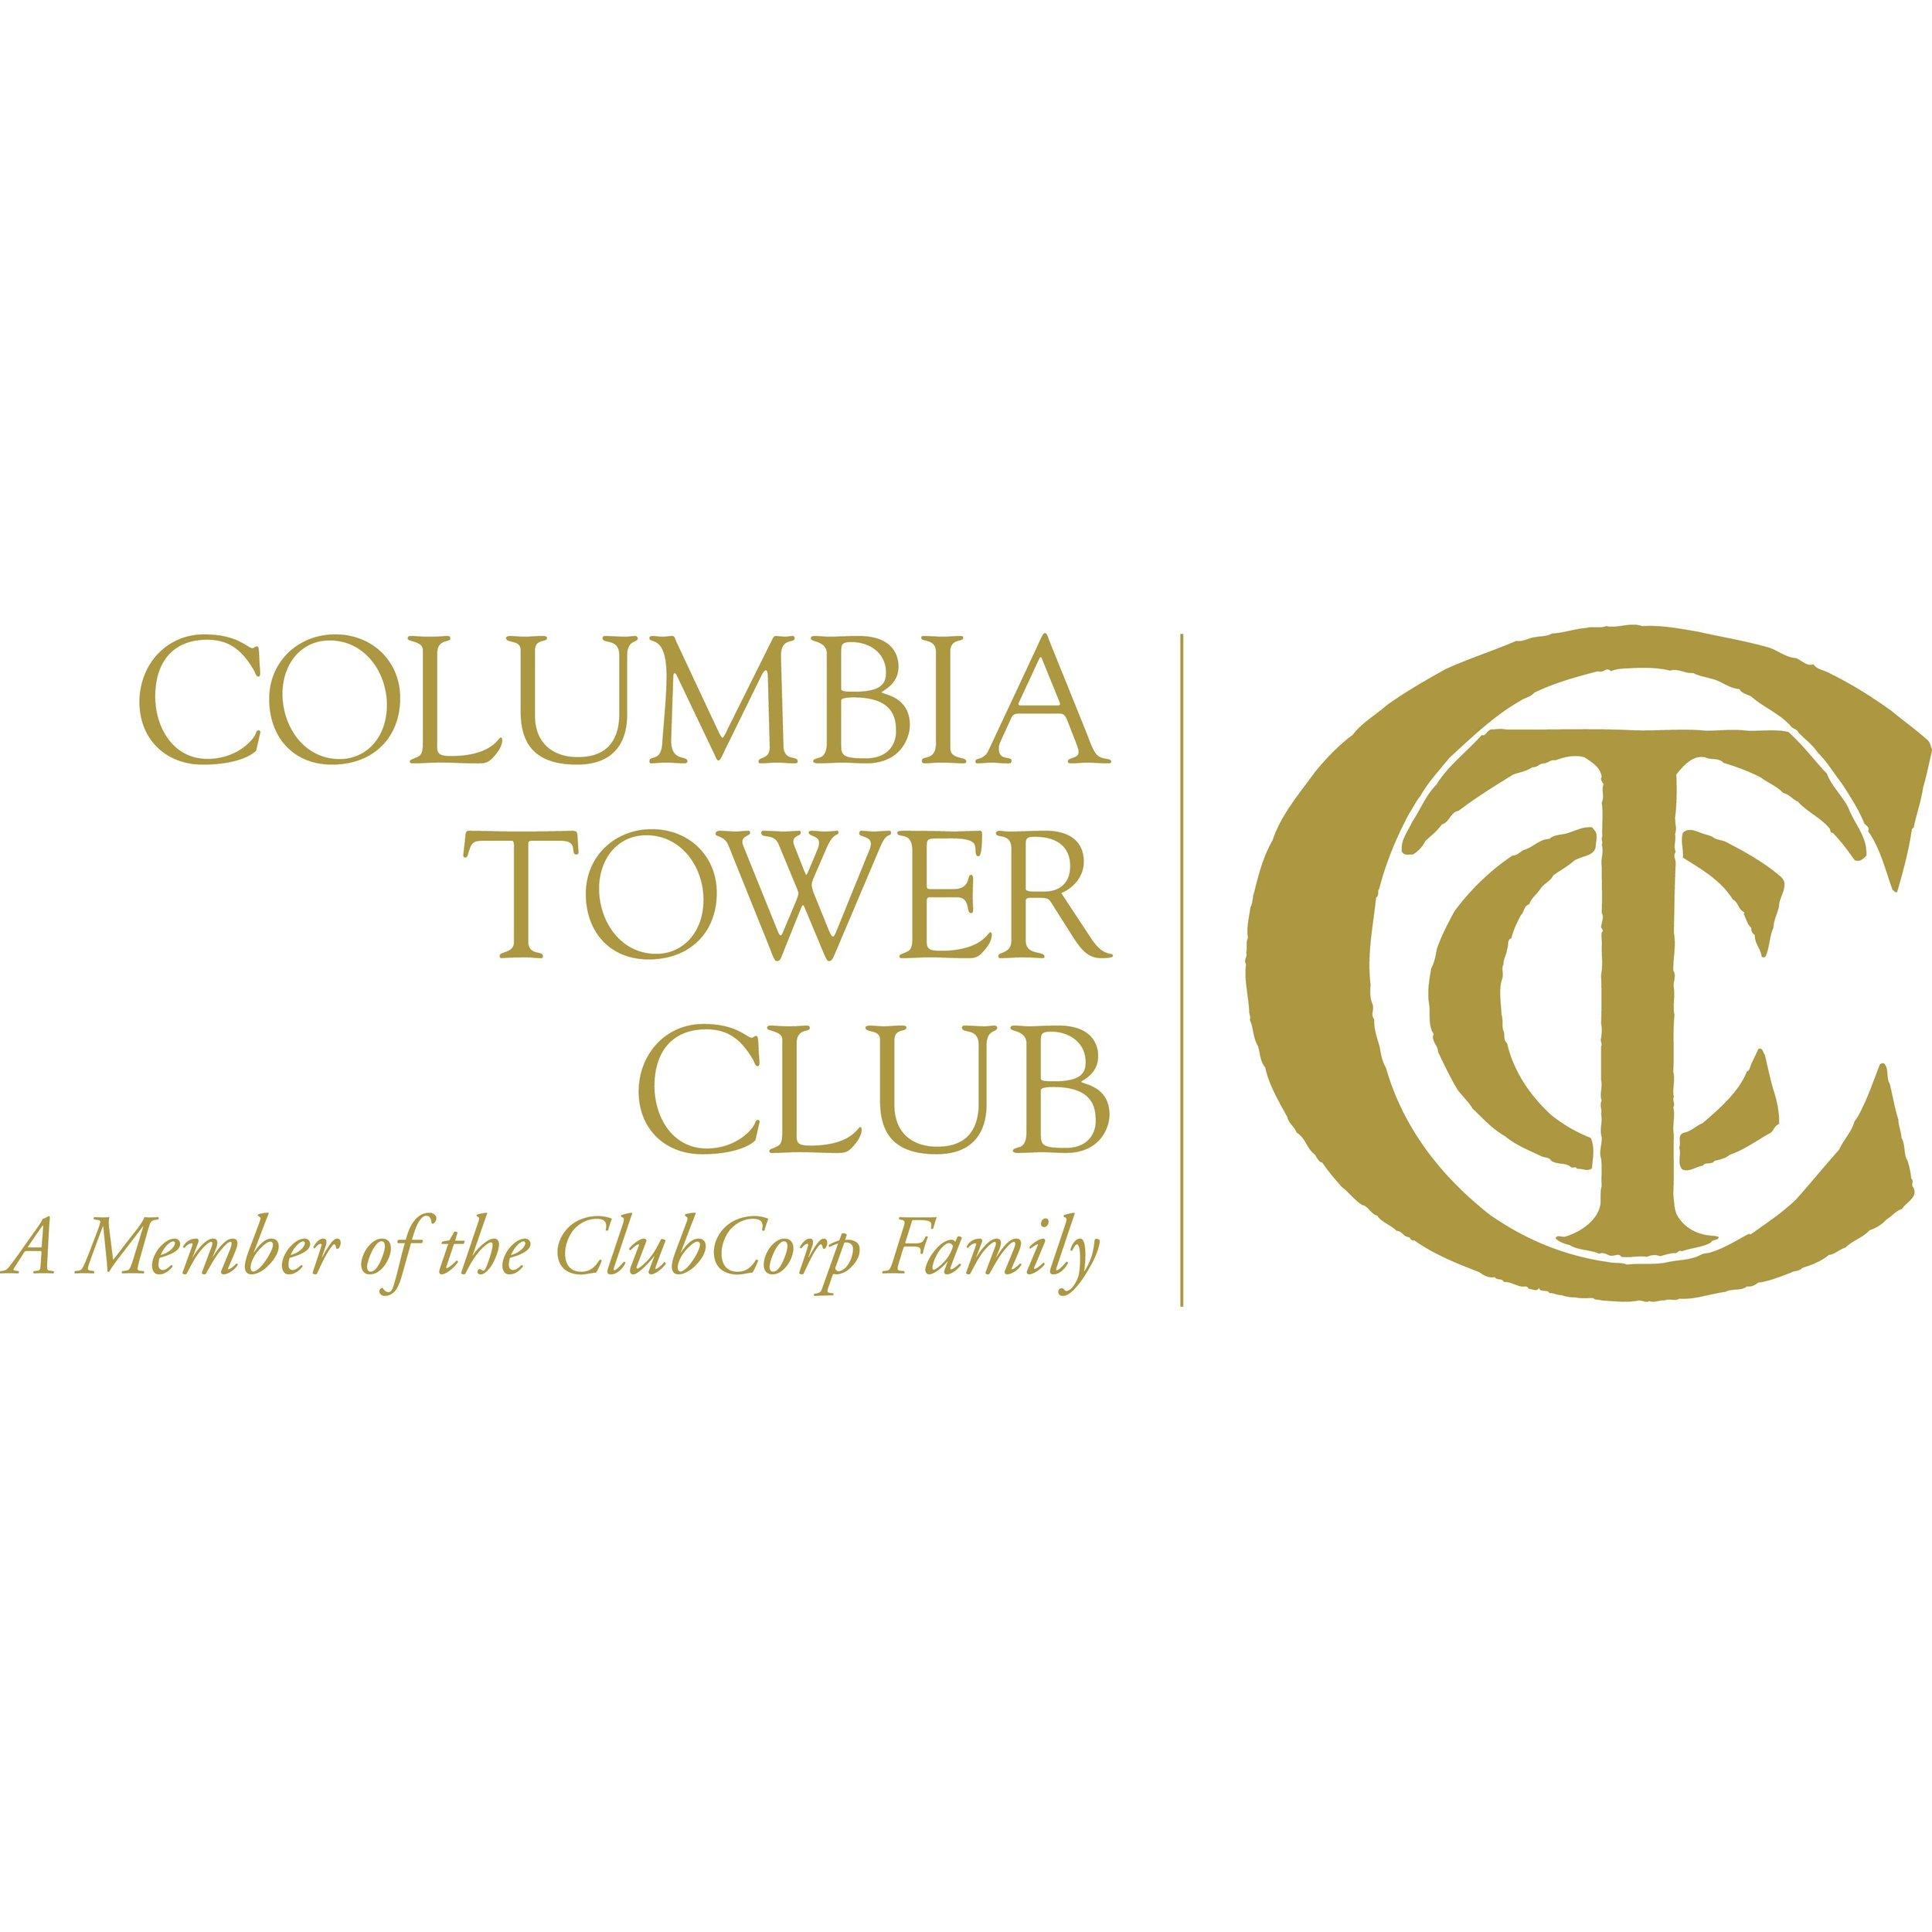 Columbia Tower Club logo.jpg